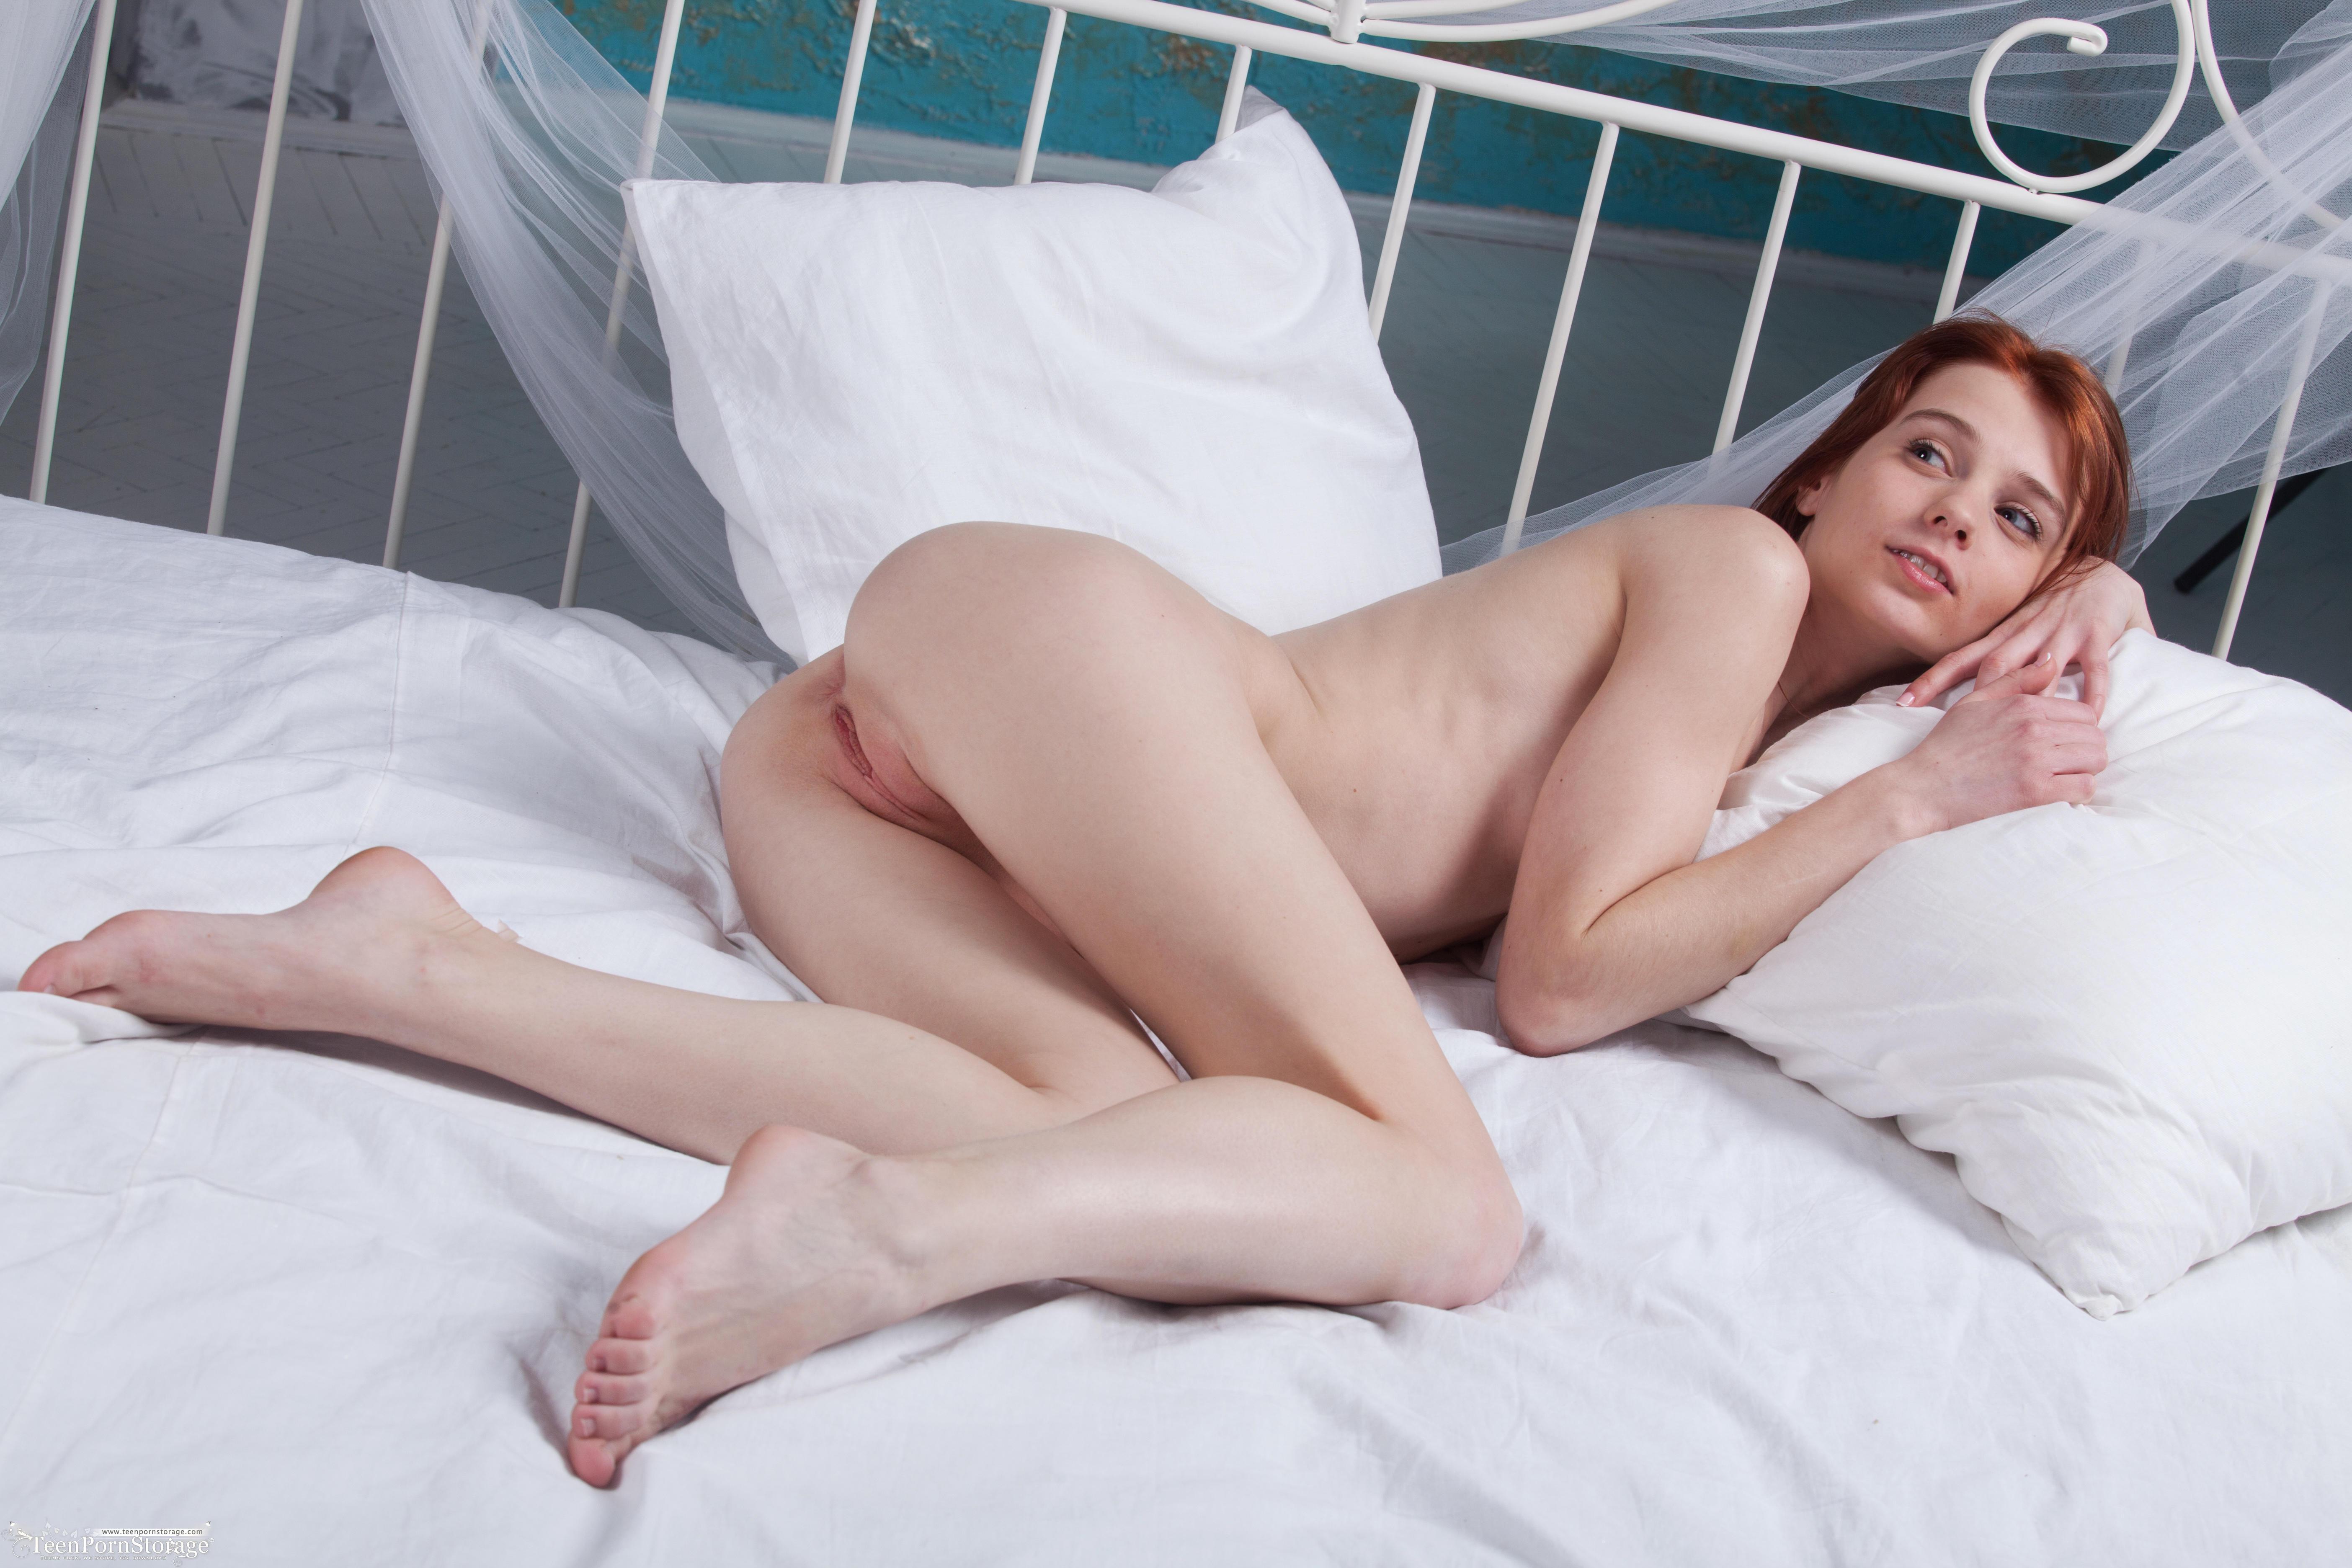 обои Lilu, красотка, голая, голая девушка картинки фото